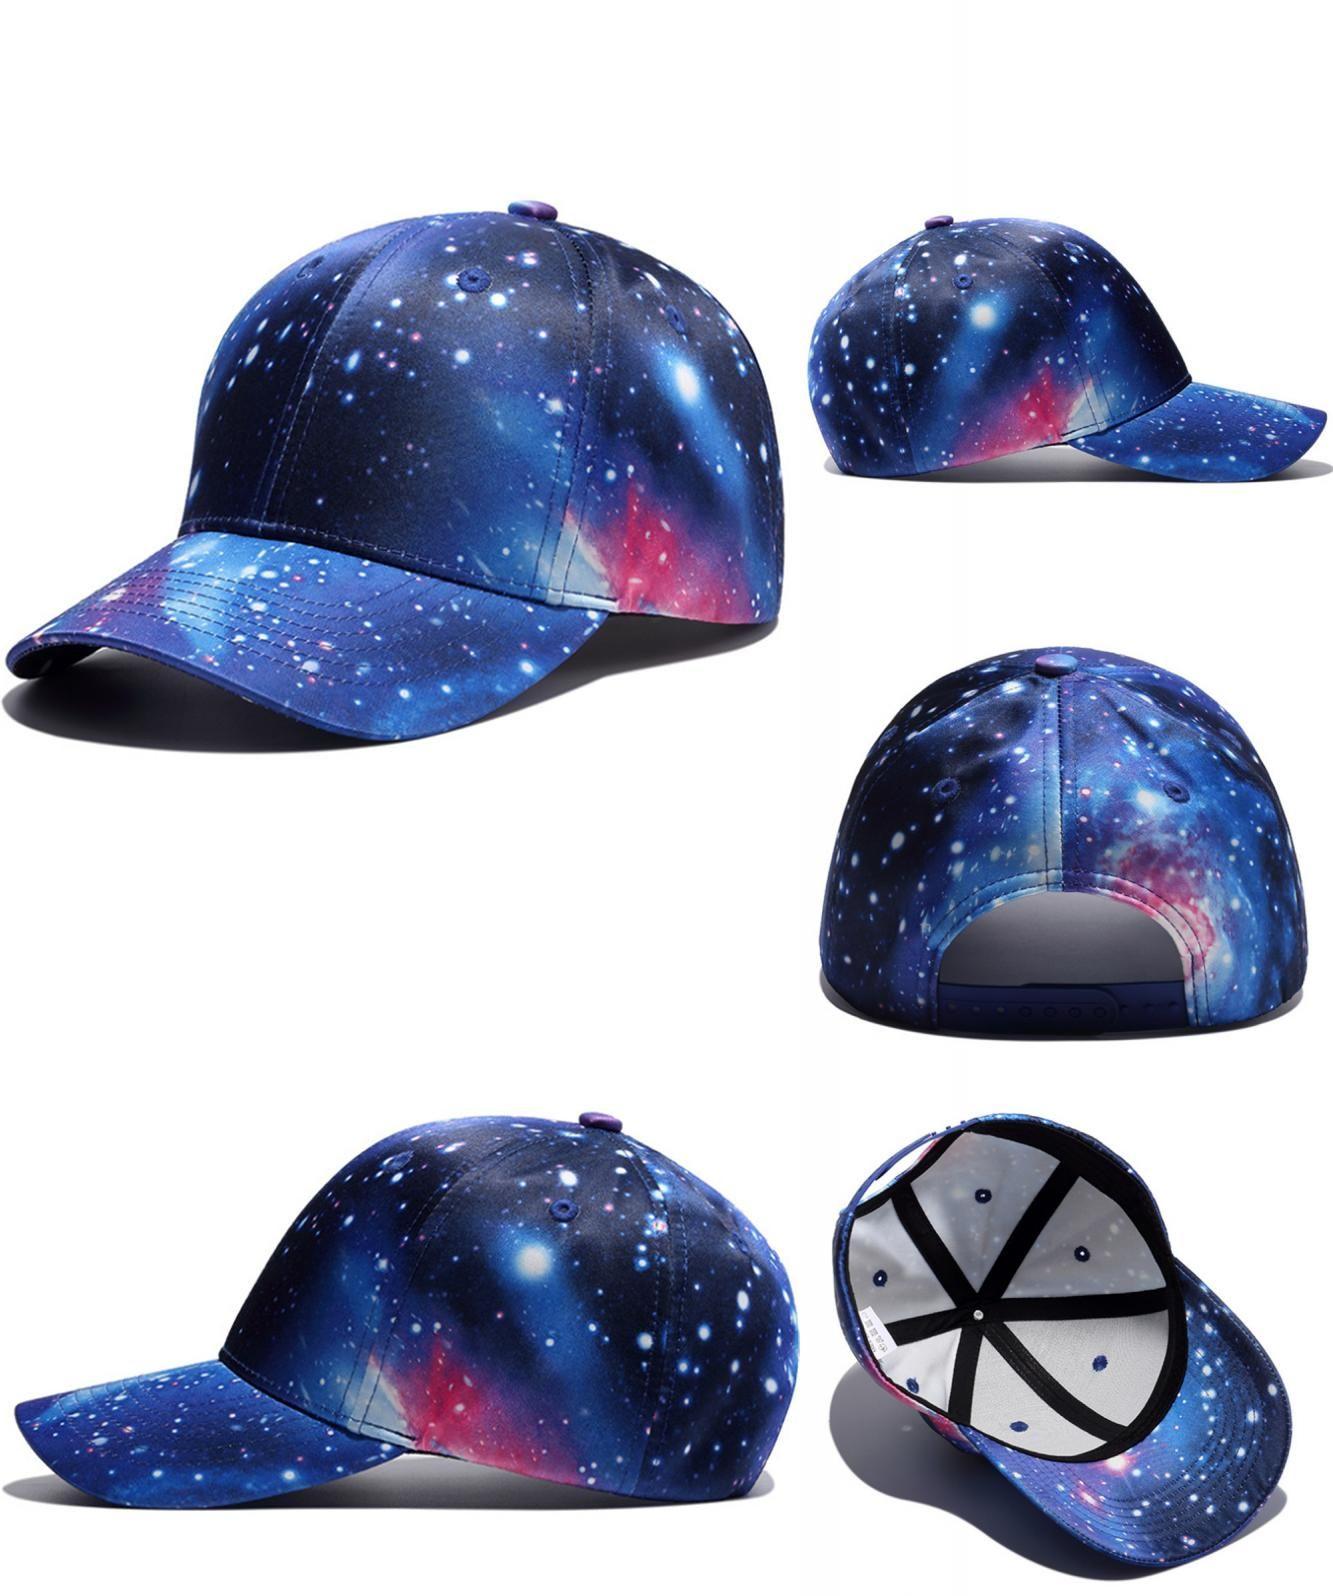 b0de551115e  Visit to Buy  New 3D Print Galaxy Unisex Baseball Cap Men Snapback Hats  Holiday